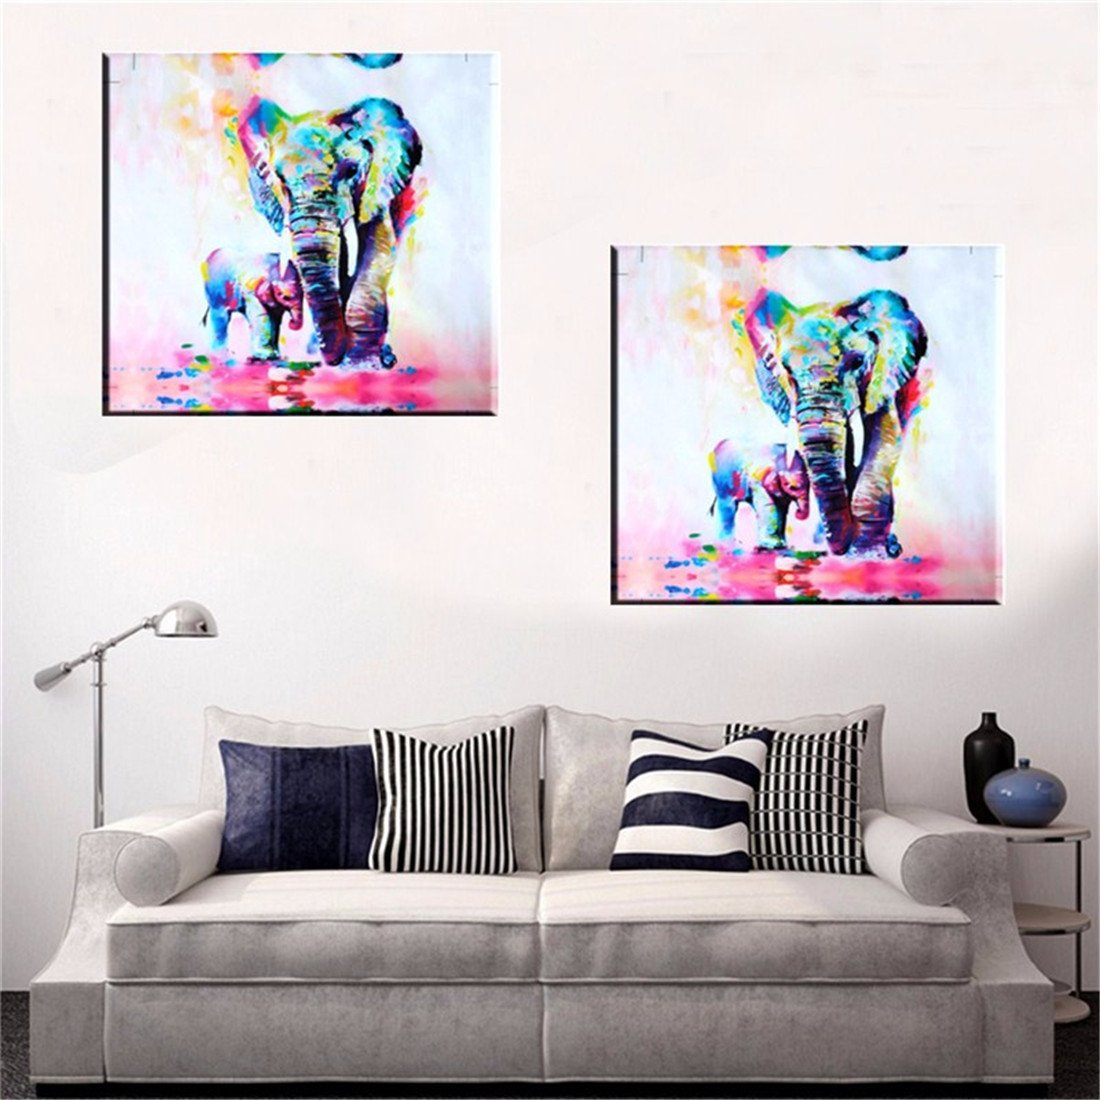 Amazon.com: MOHOO 50x50cm Elephant Oil Painting Canvas Wall Art wall ...